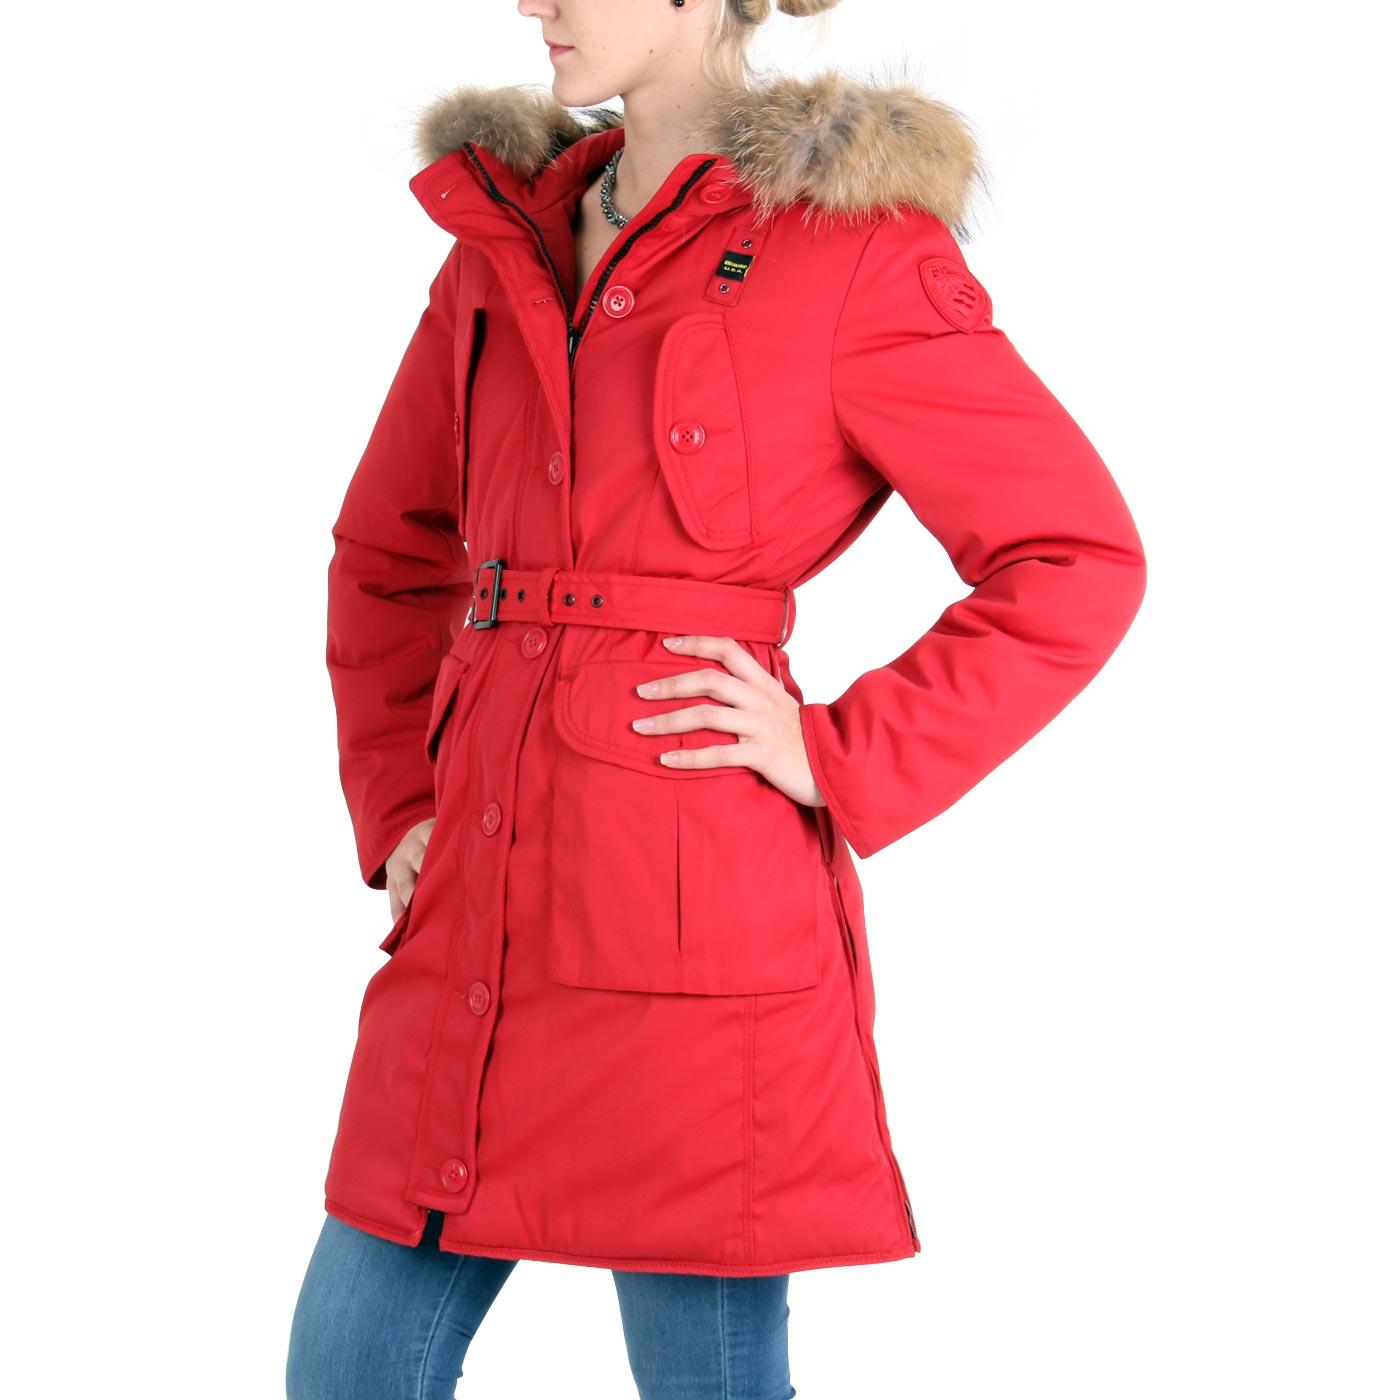 blauer usa damen winter daunen parka mantel jacke red bld0439 ebay. Black Bedroom Furniture Sets. Home Design Ideas